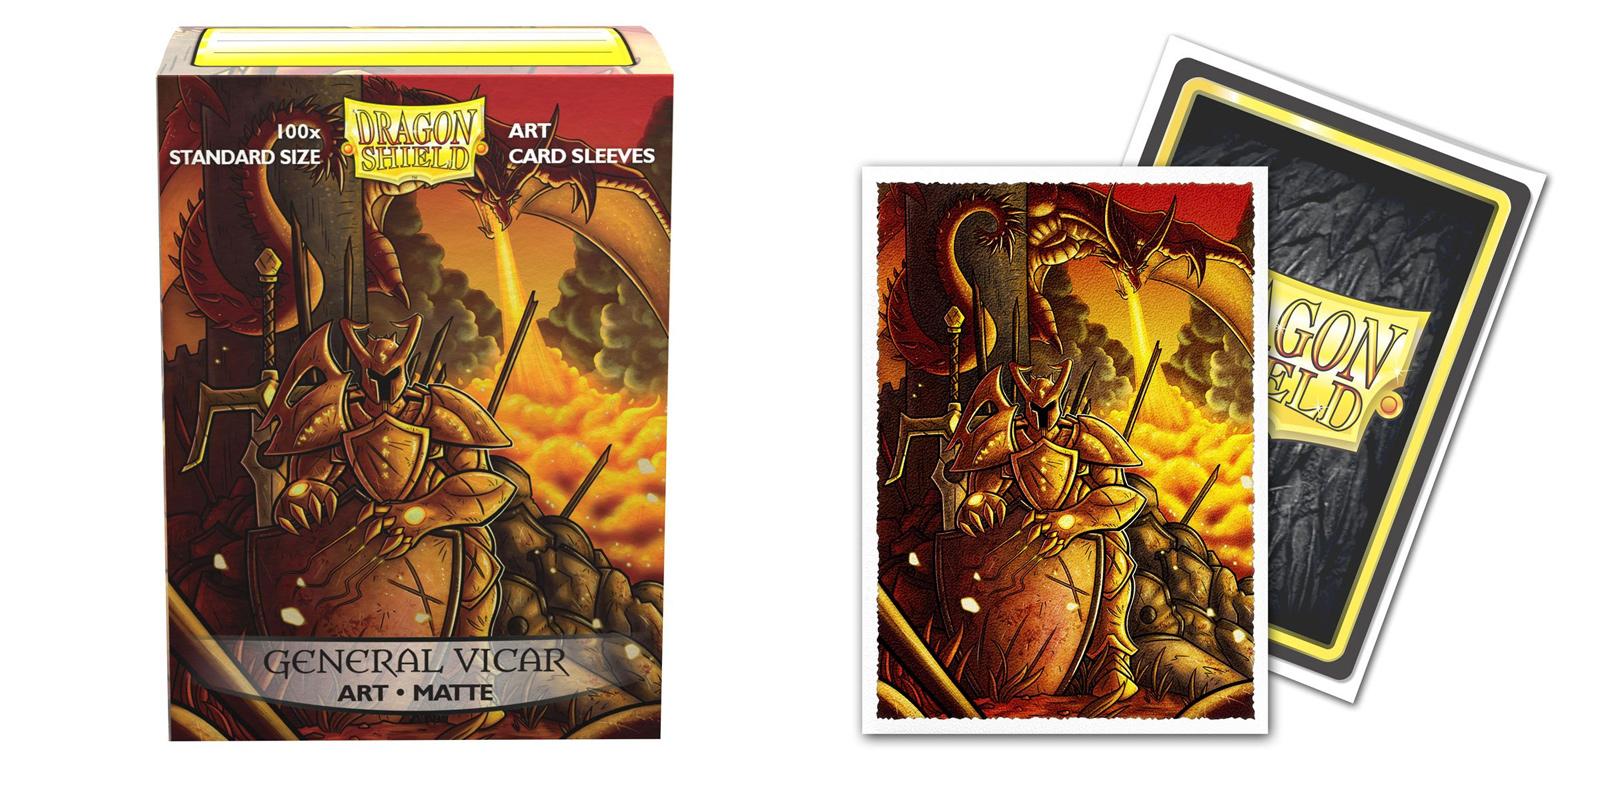 Dragon Shield Sleeves: General Vicar Portrait Matte Art (Box of 100)